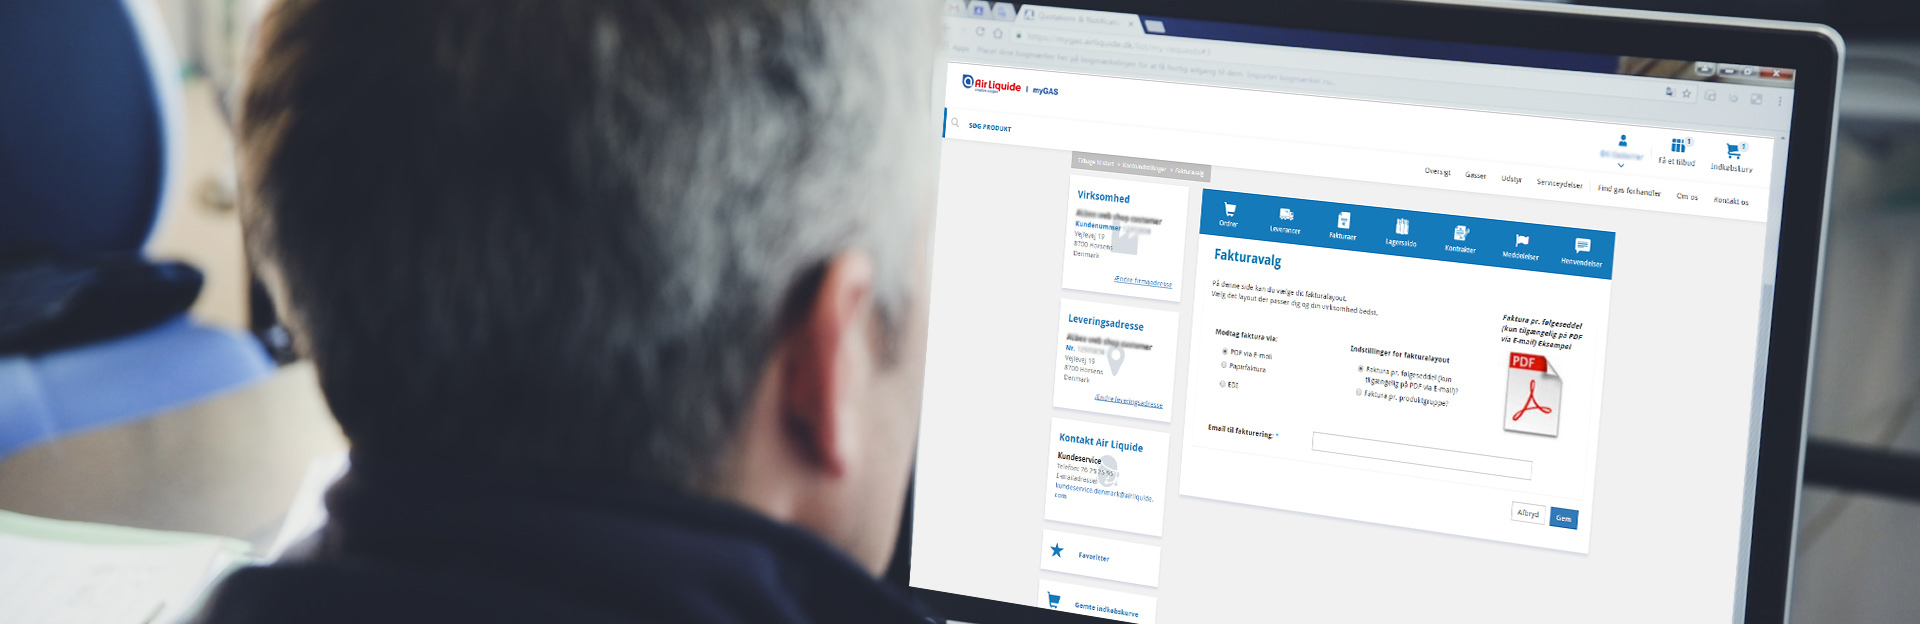 E-mailfakturering |myGAS | Air Liquide